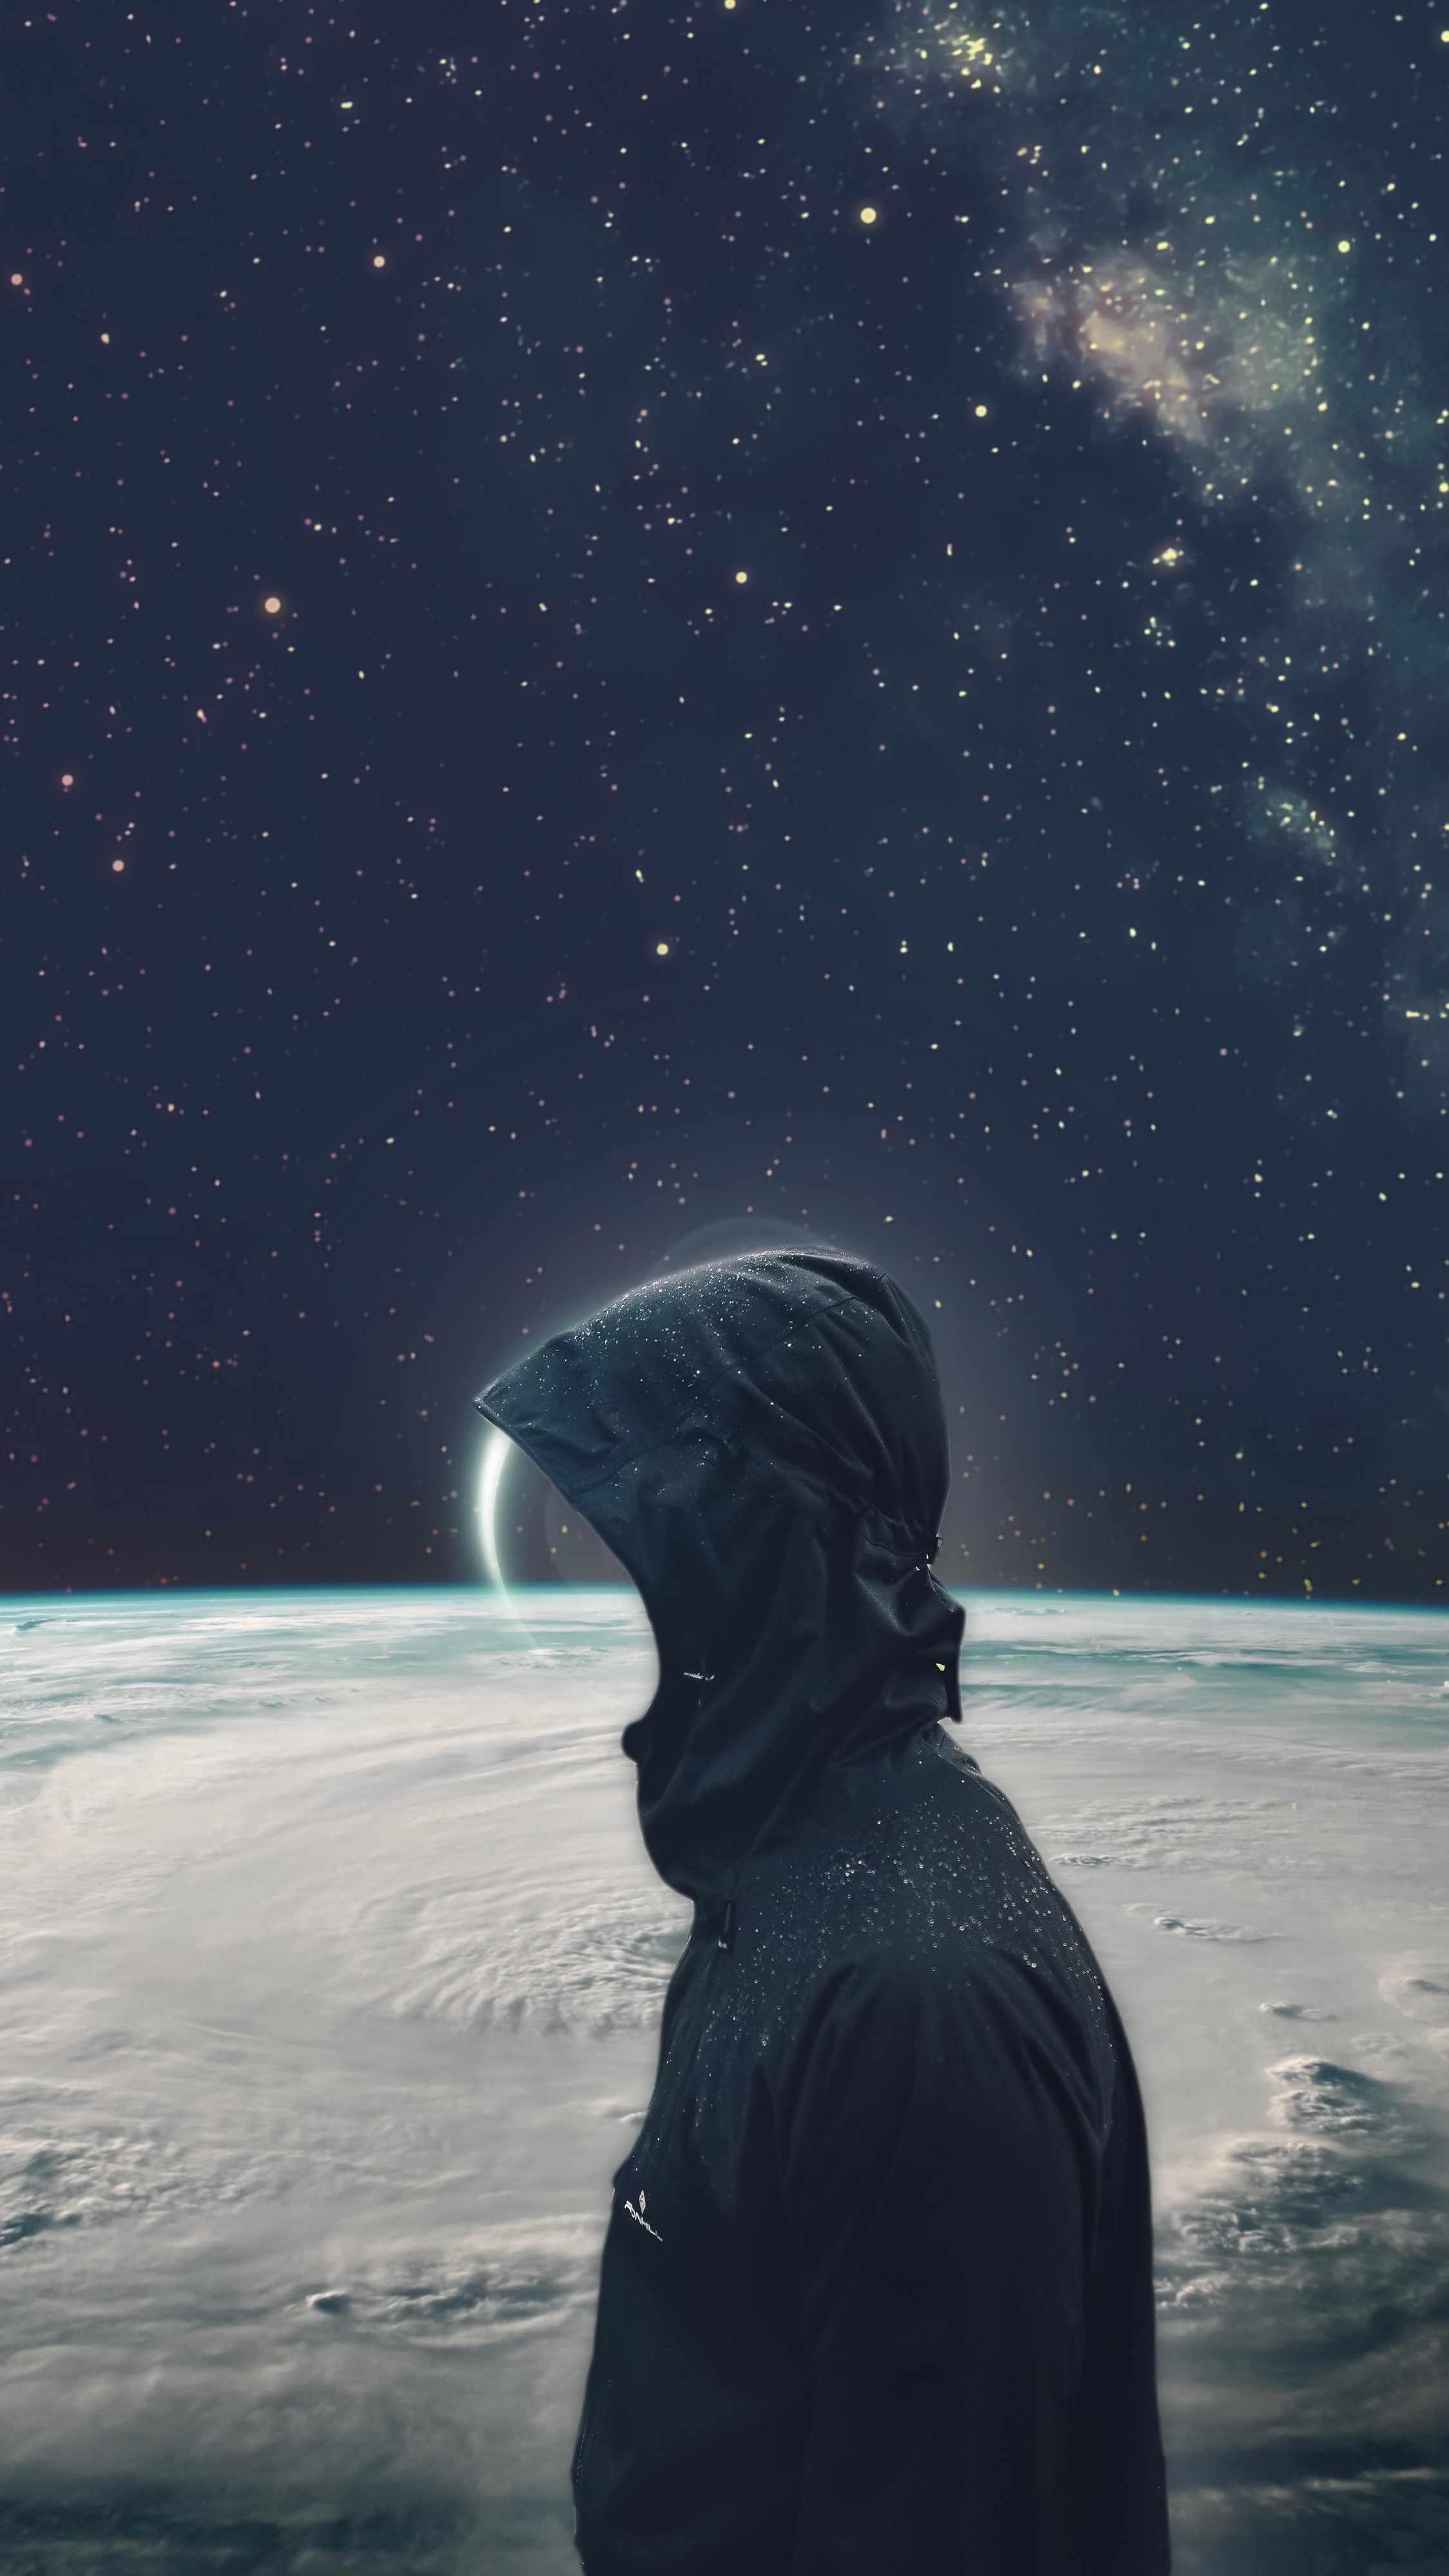 Astro man iPhone Wallpaper